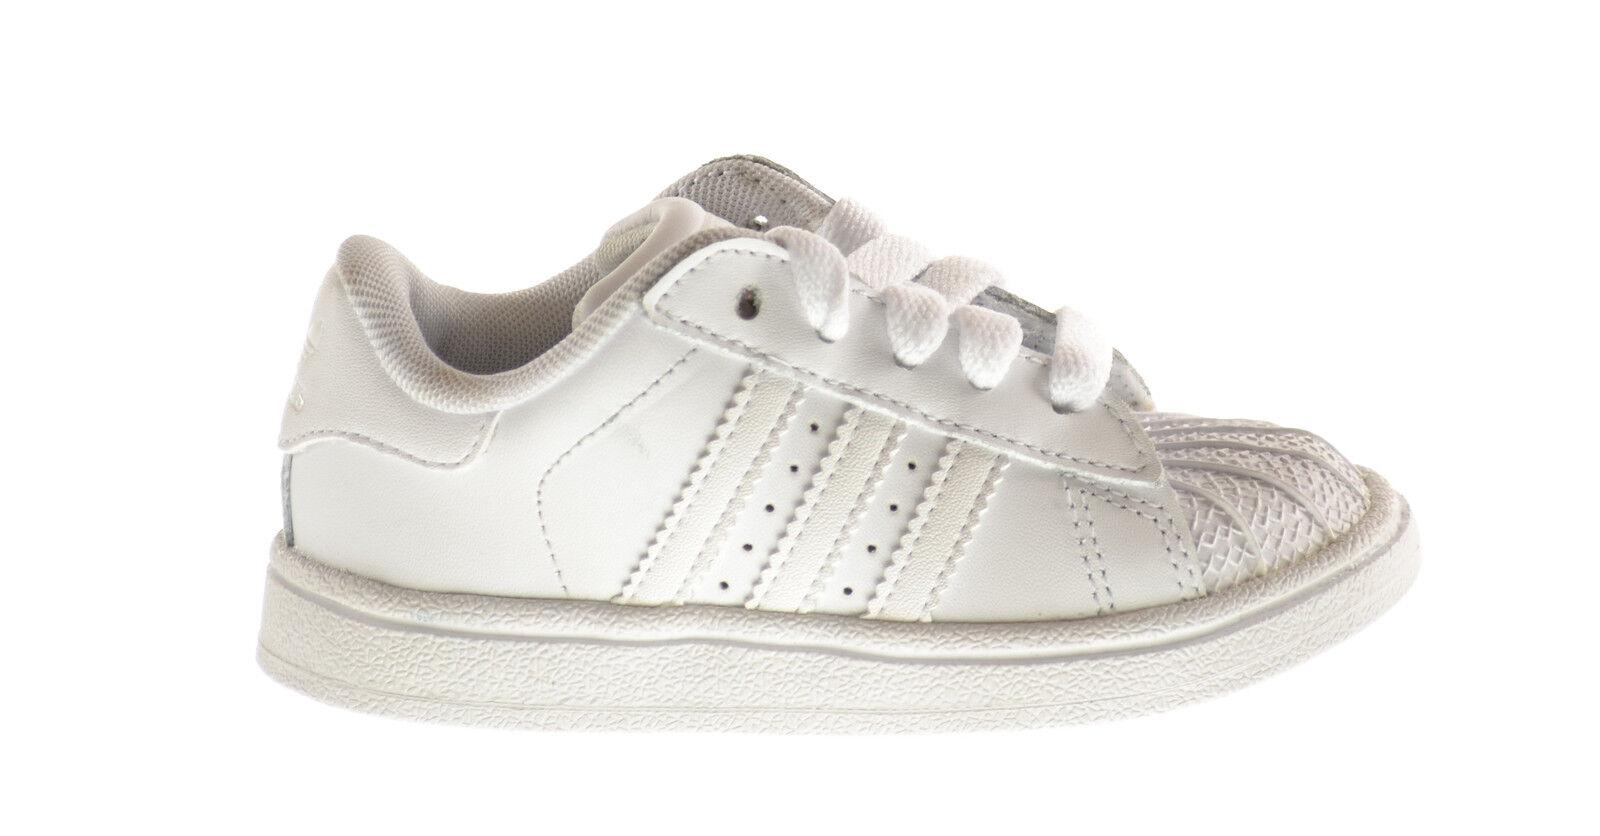 Adidas Superstar II 2 Infant Shoes Run White/Run White 901038